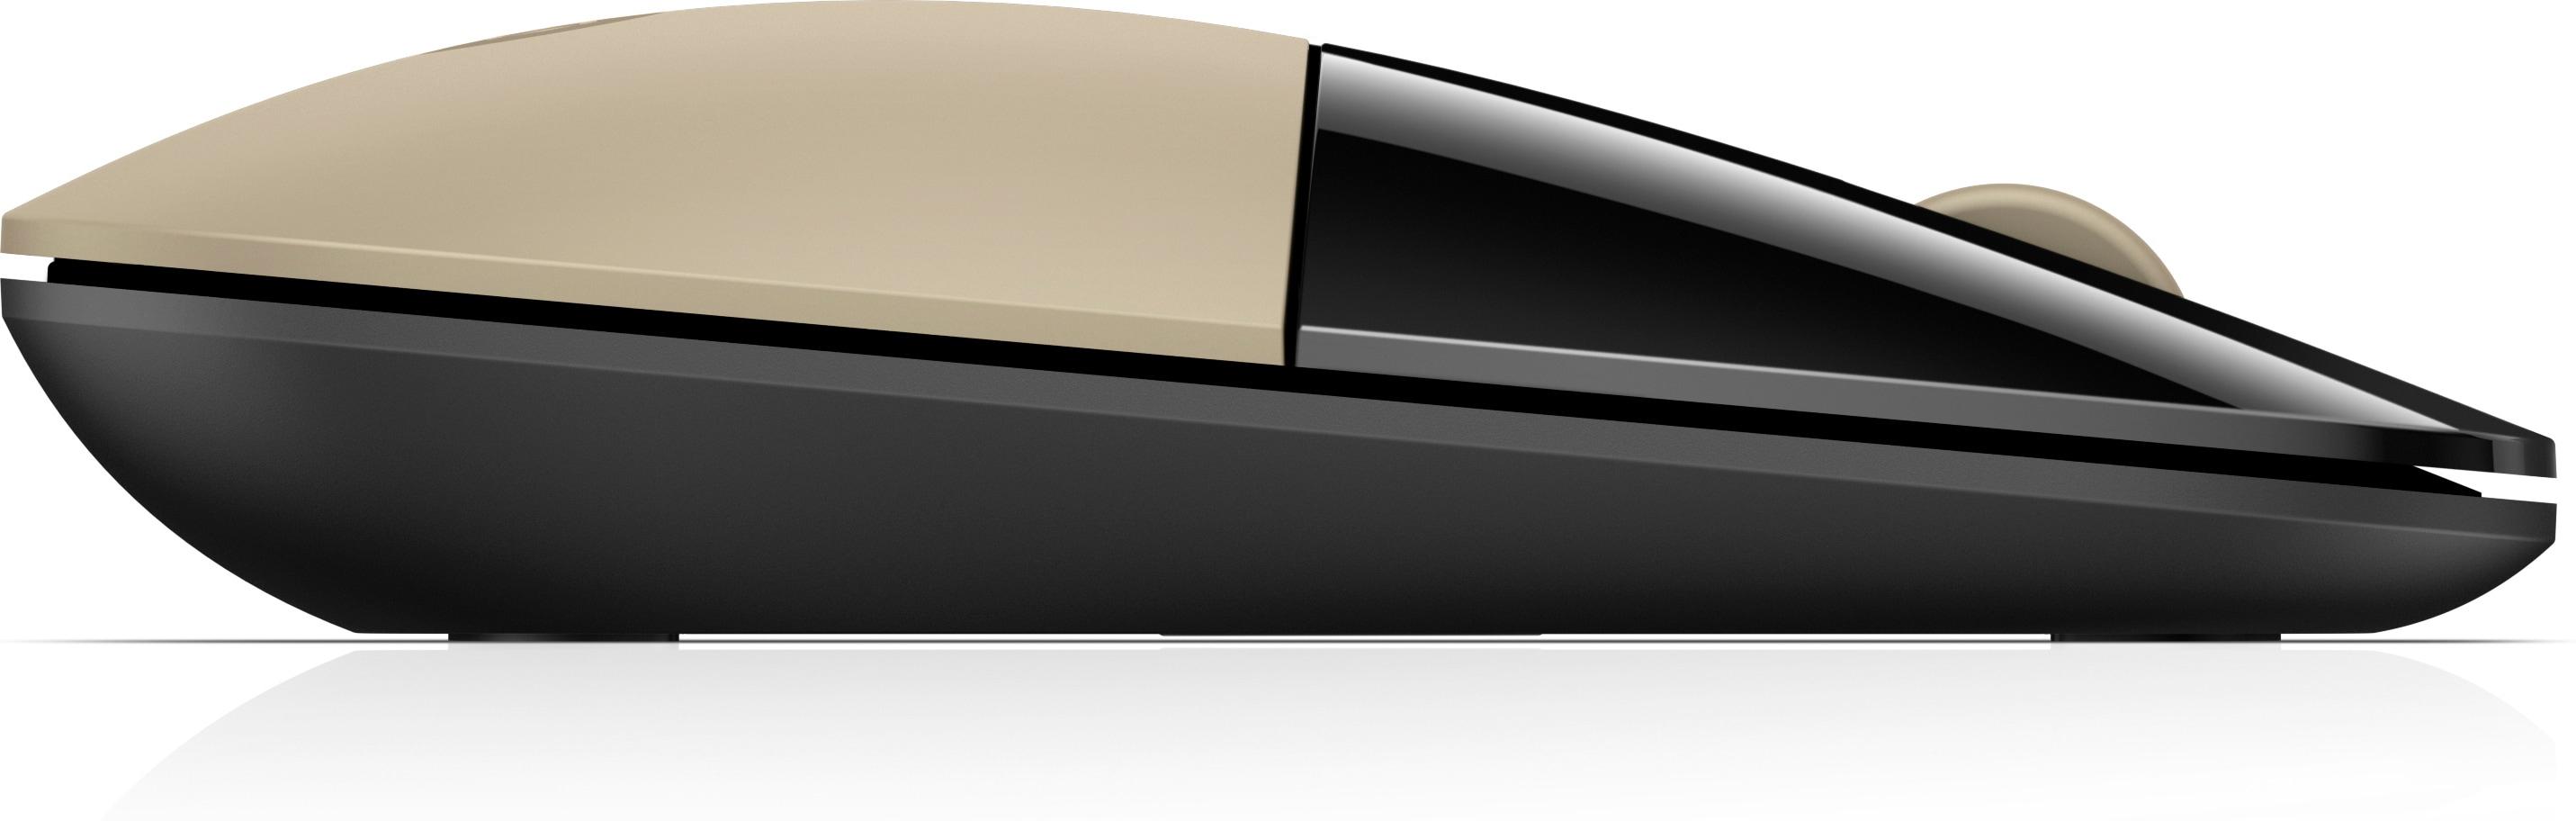 Z3700 Wireless Mouse (goud)